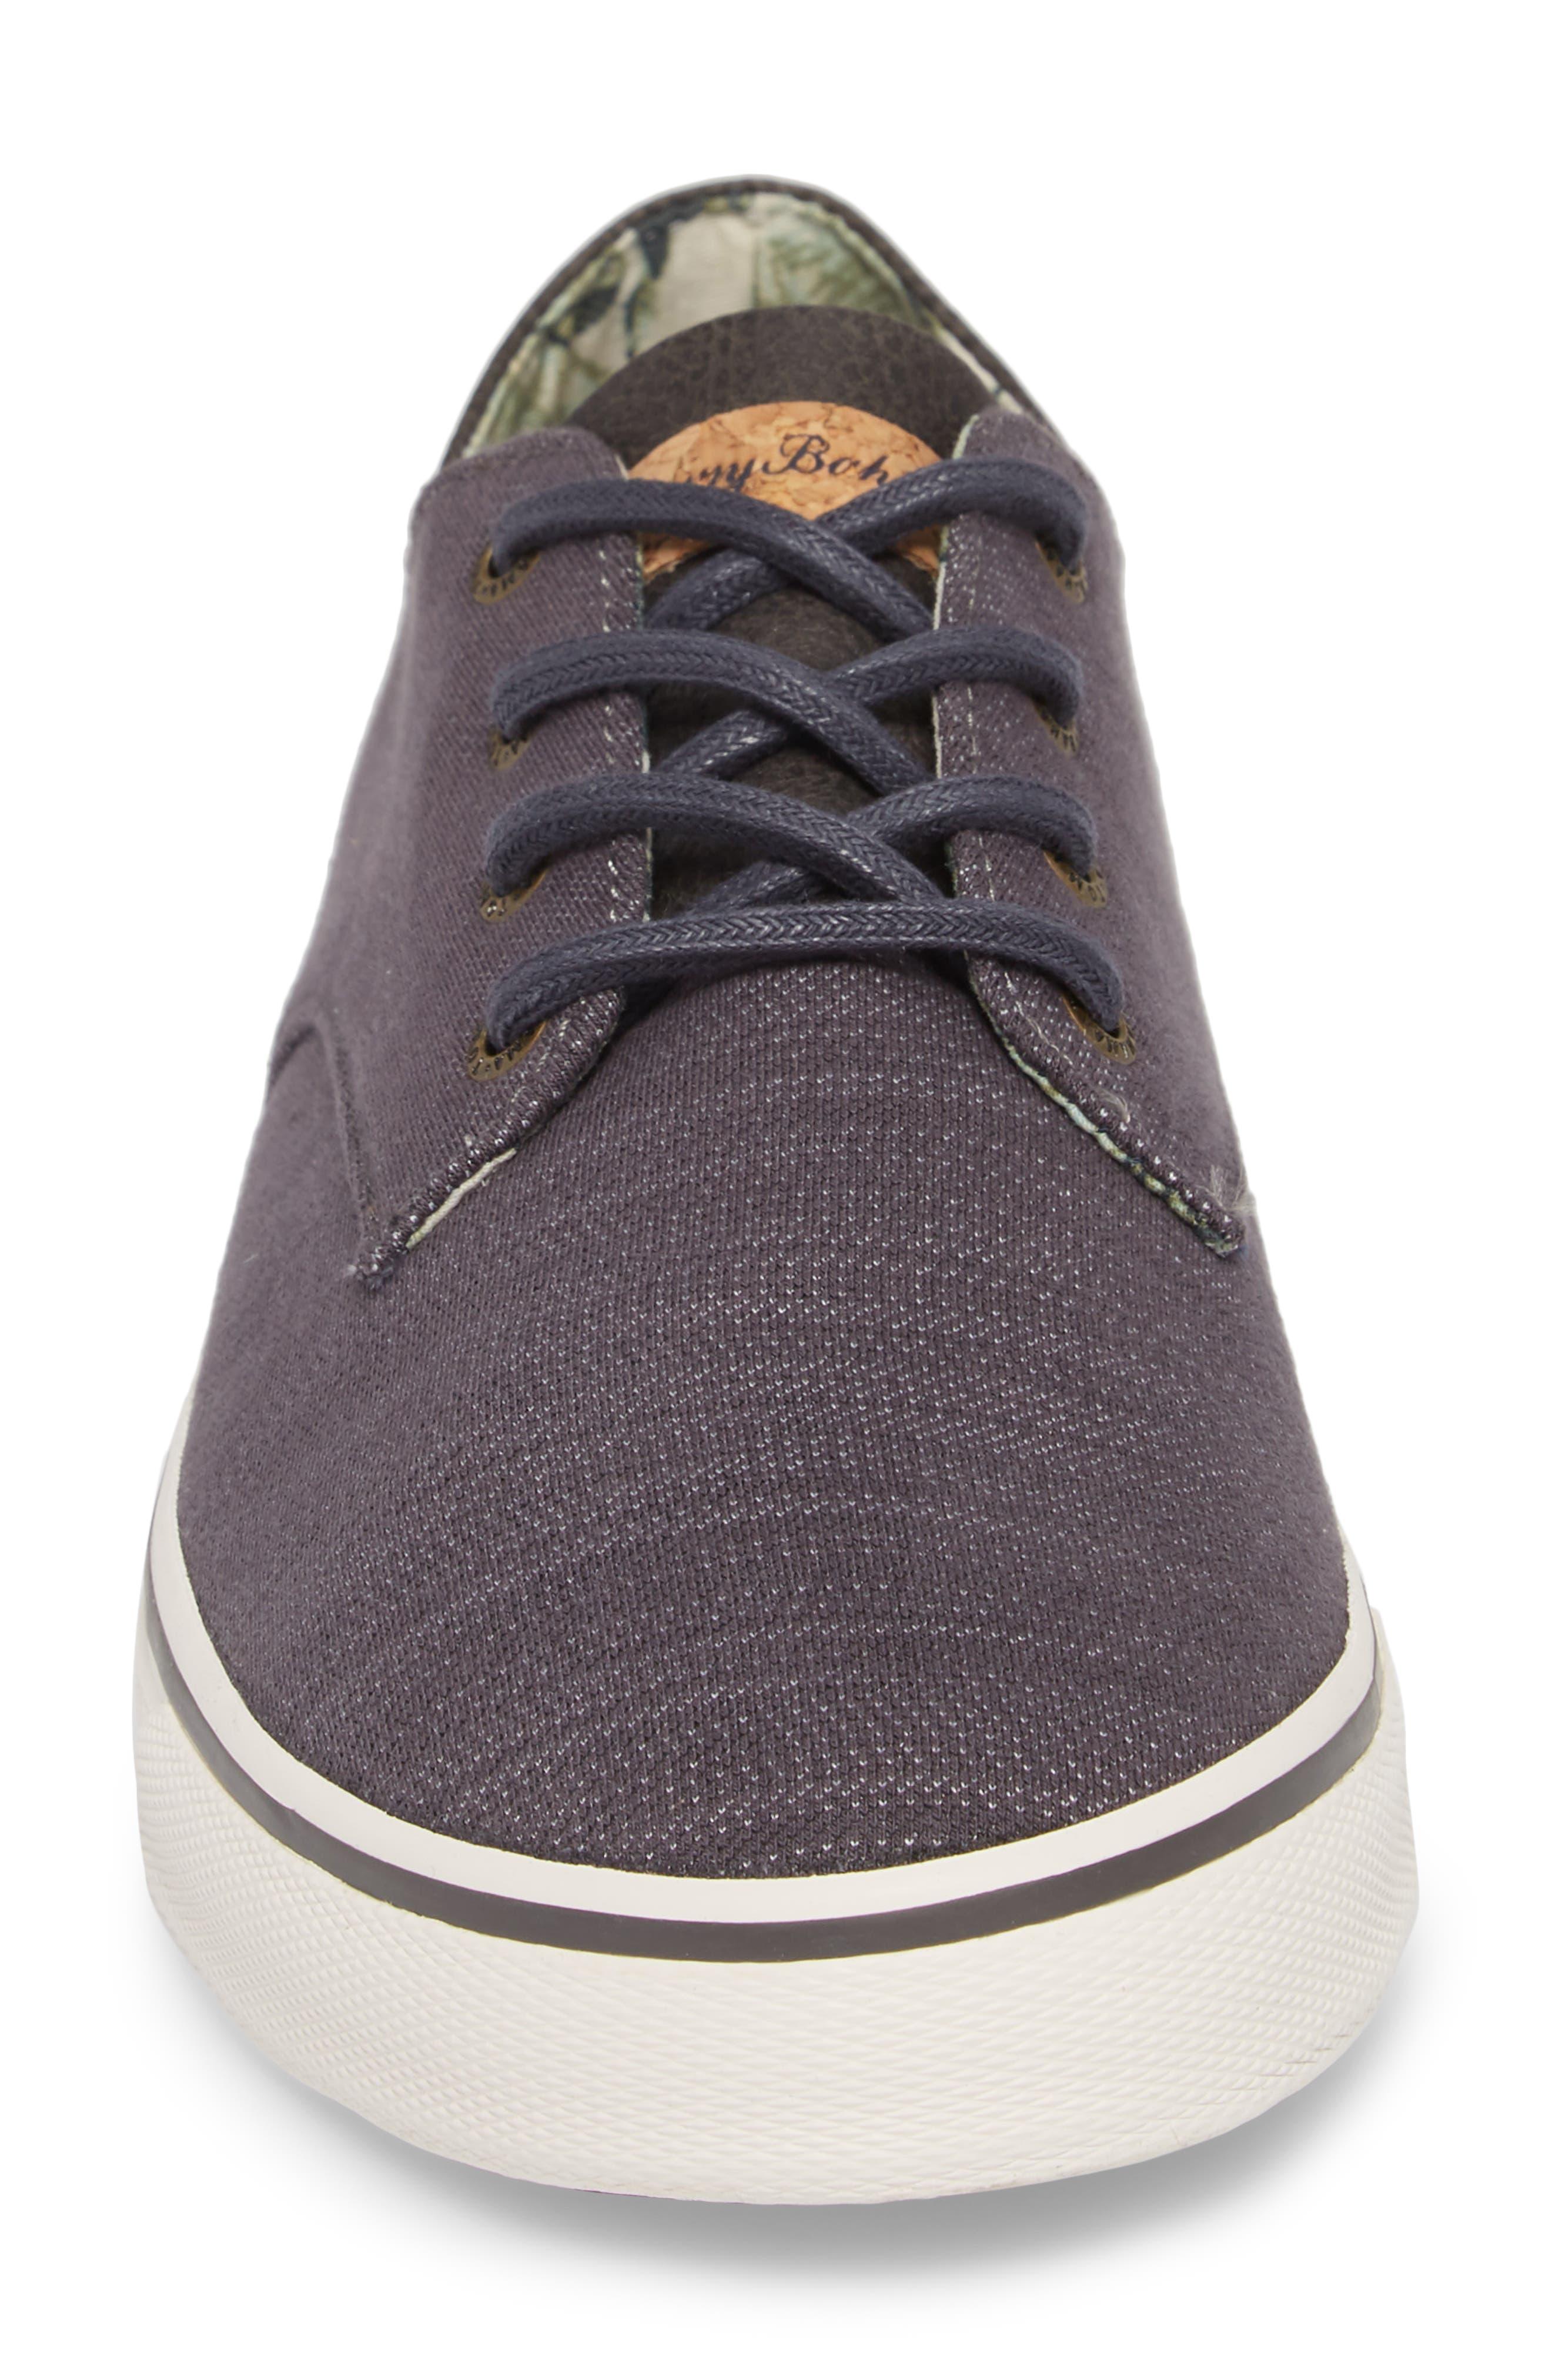 Dune Sneaker,                             Alternate thumbnail 4, color,                             Grey Denim